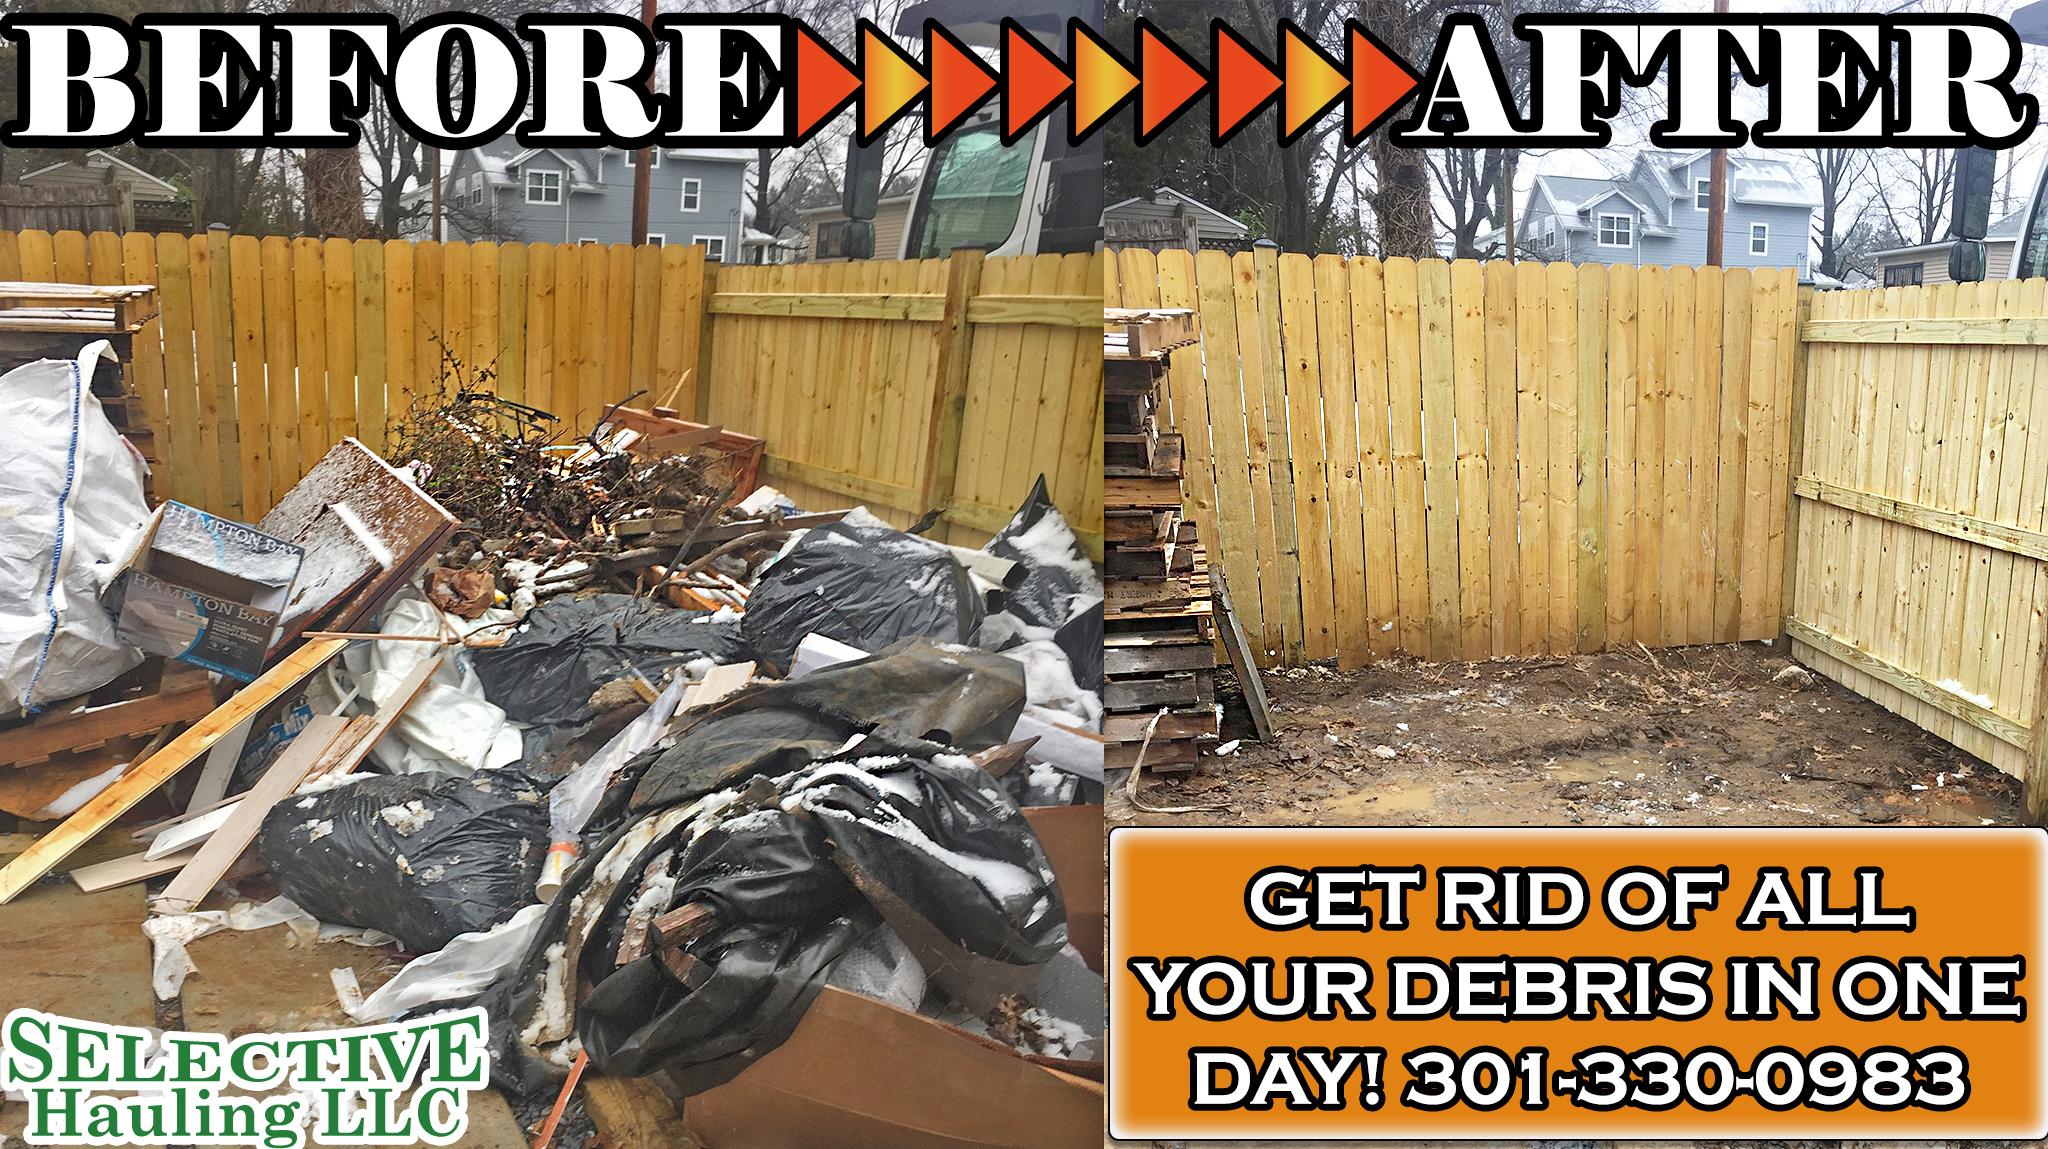 junk removal service Northern Virginia